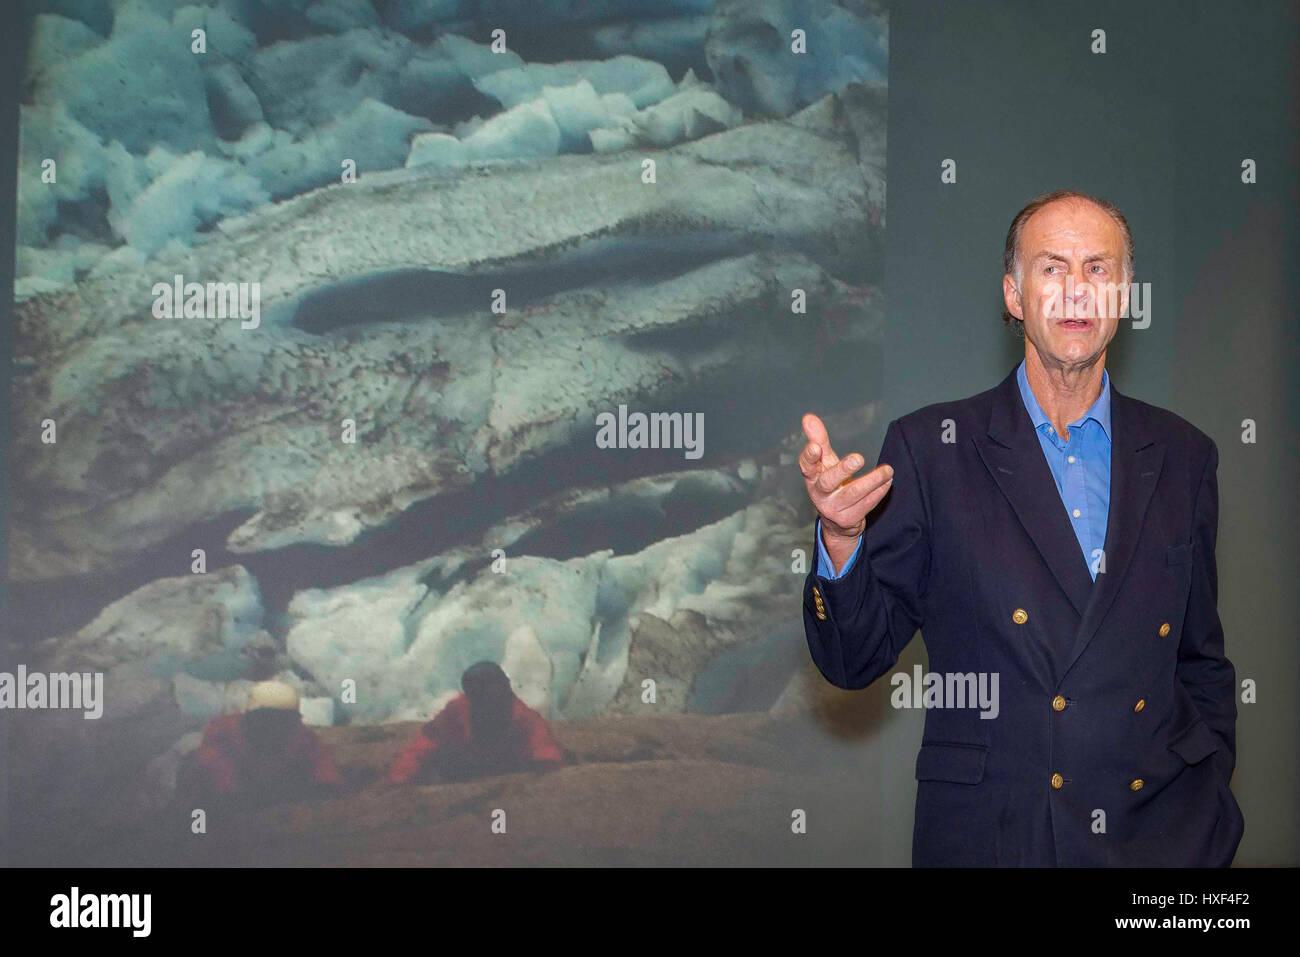 Sir Ranulph Fiennes. - Stock Image